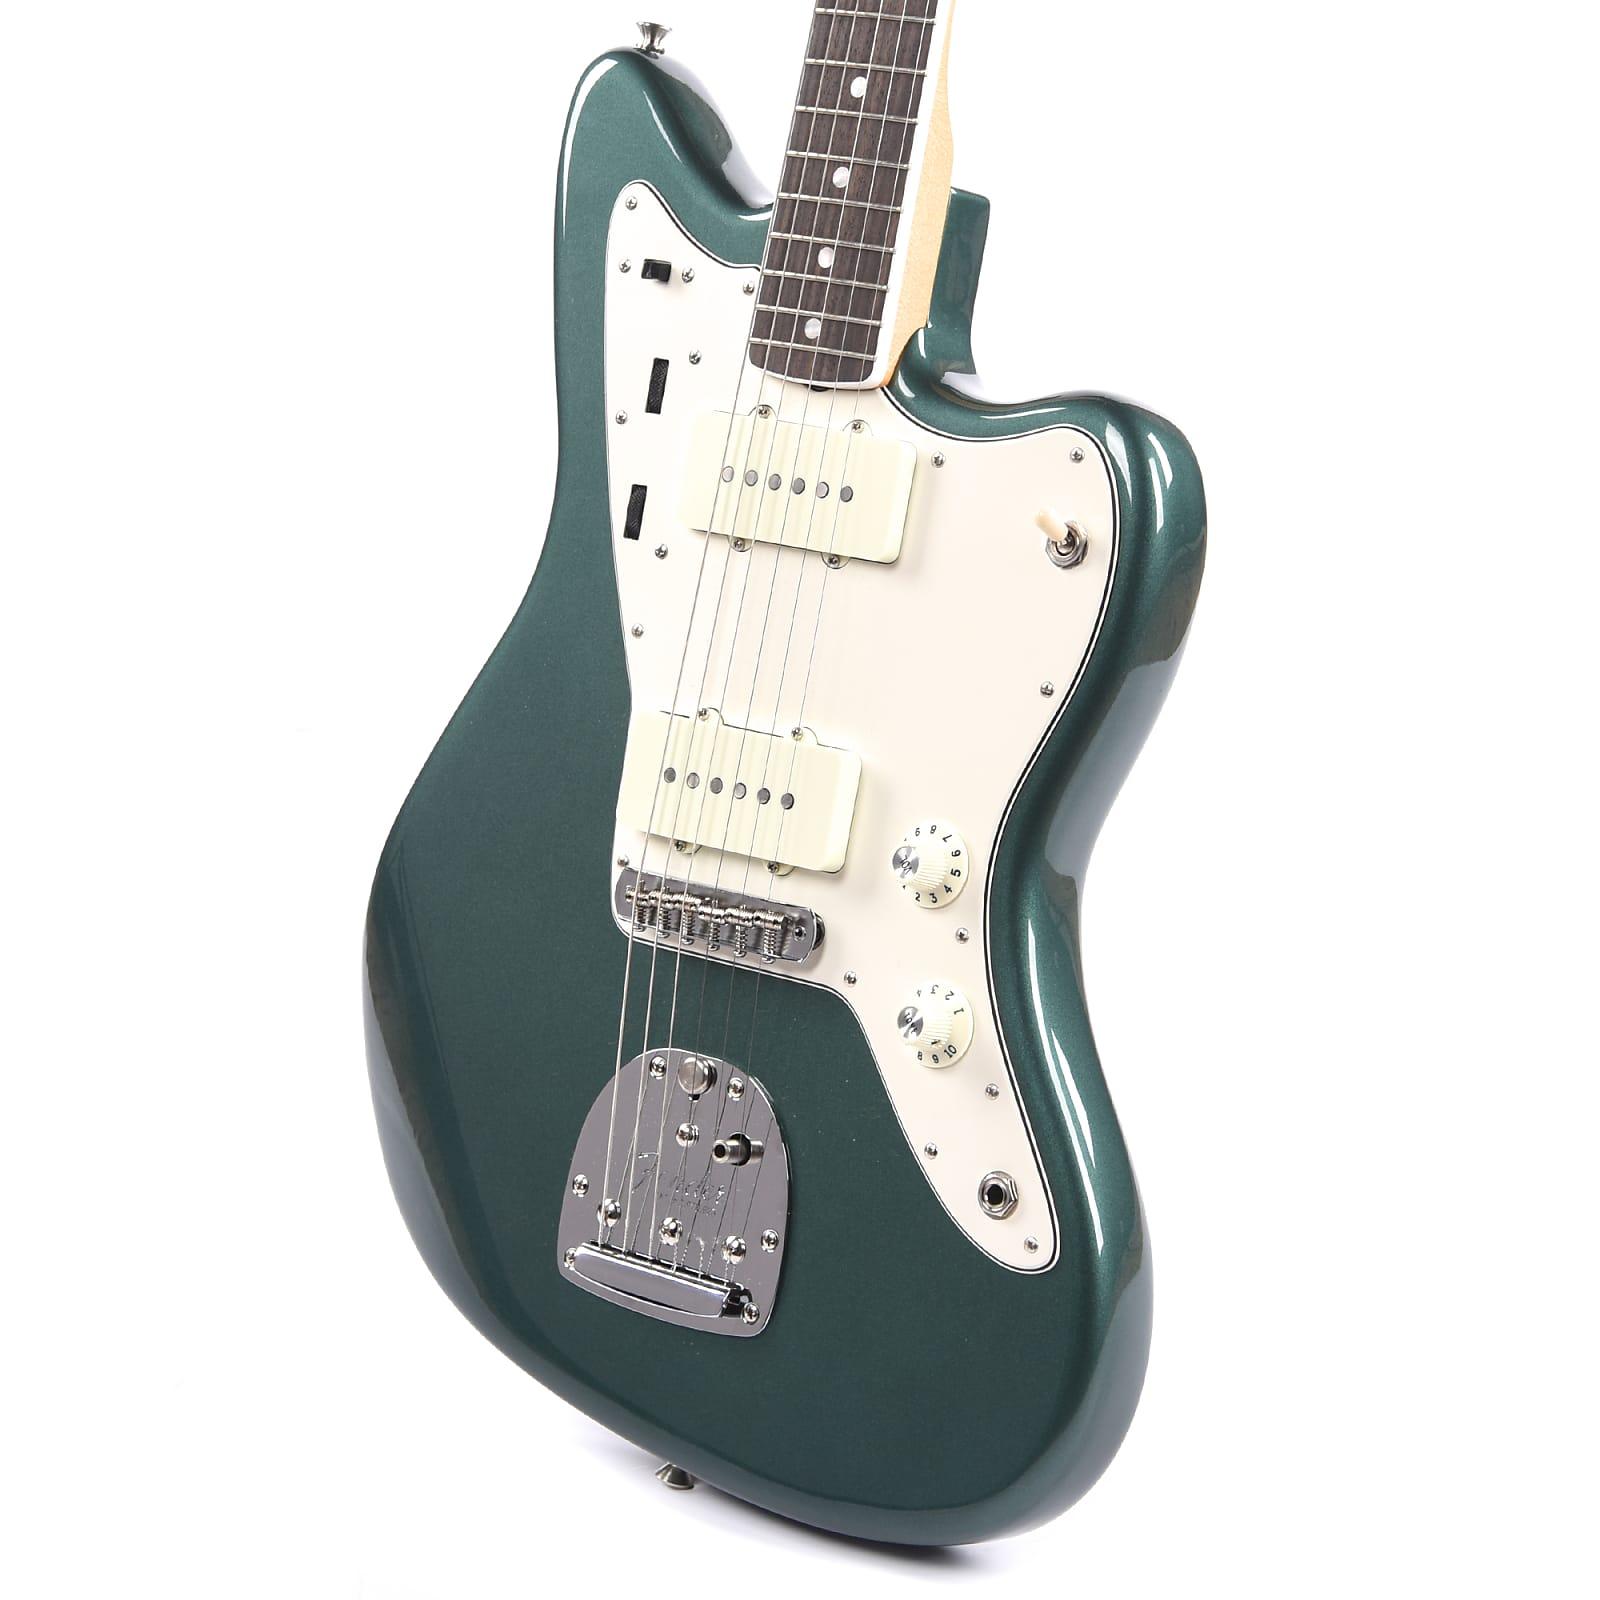 Fender American Original Jazzmaster Sherwood Green Metallic w/Painted Headcap (CME Exclusive)